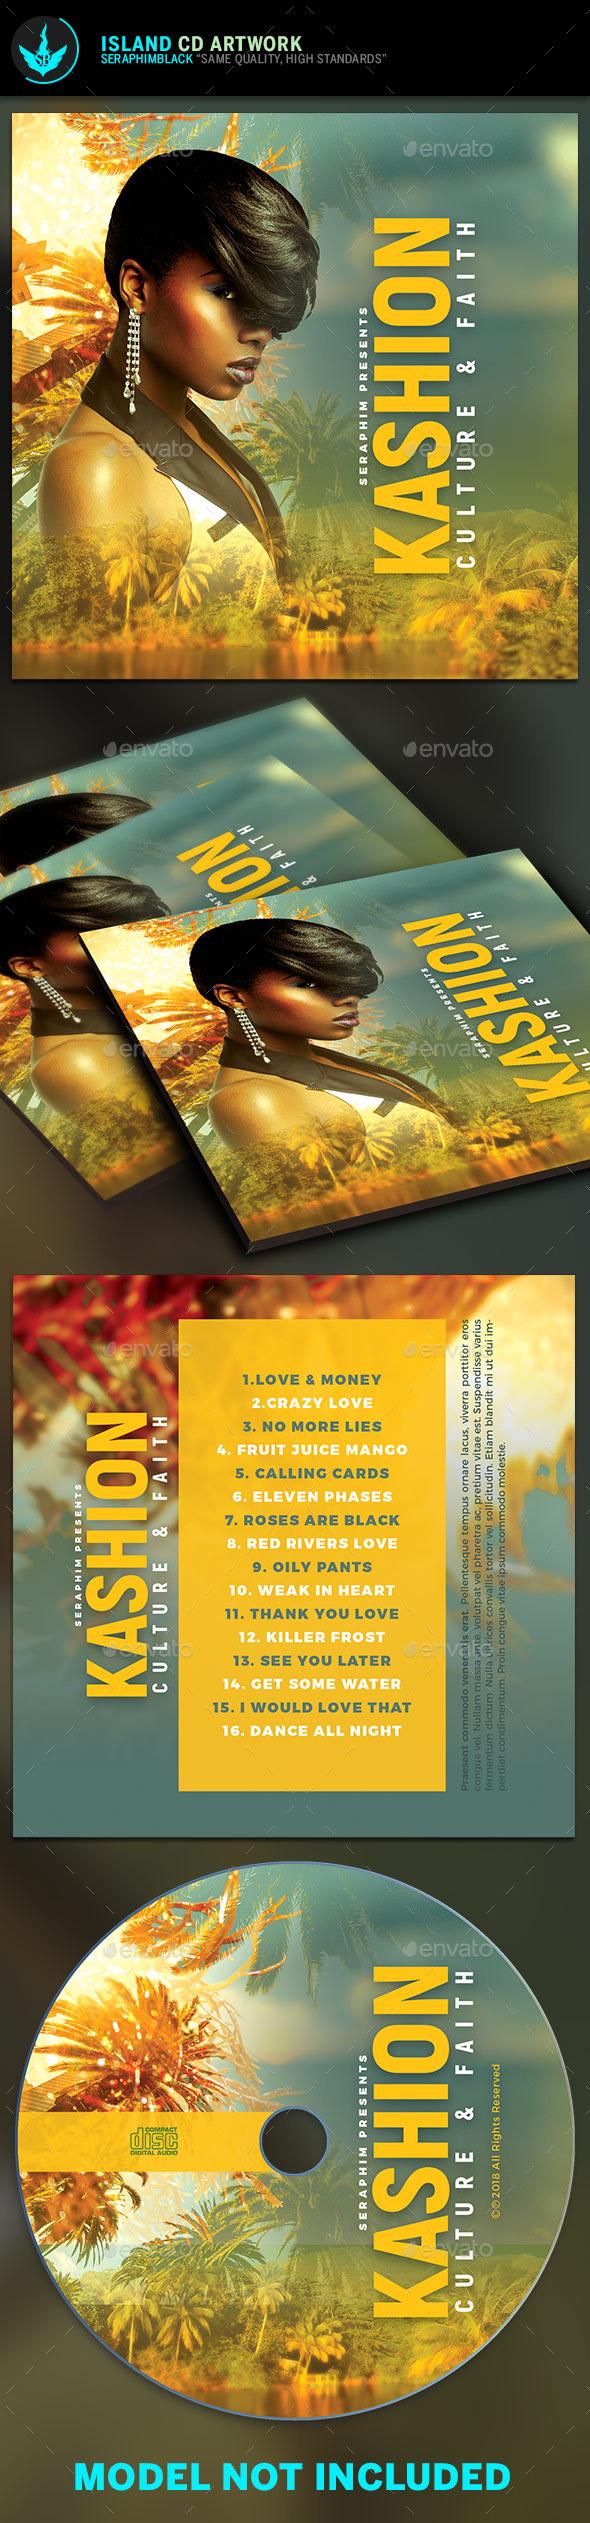 Tropical CD Artwork Template - CD & DVD Artwork Print Templates